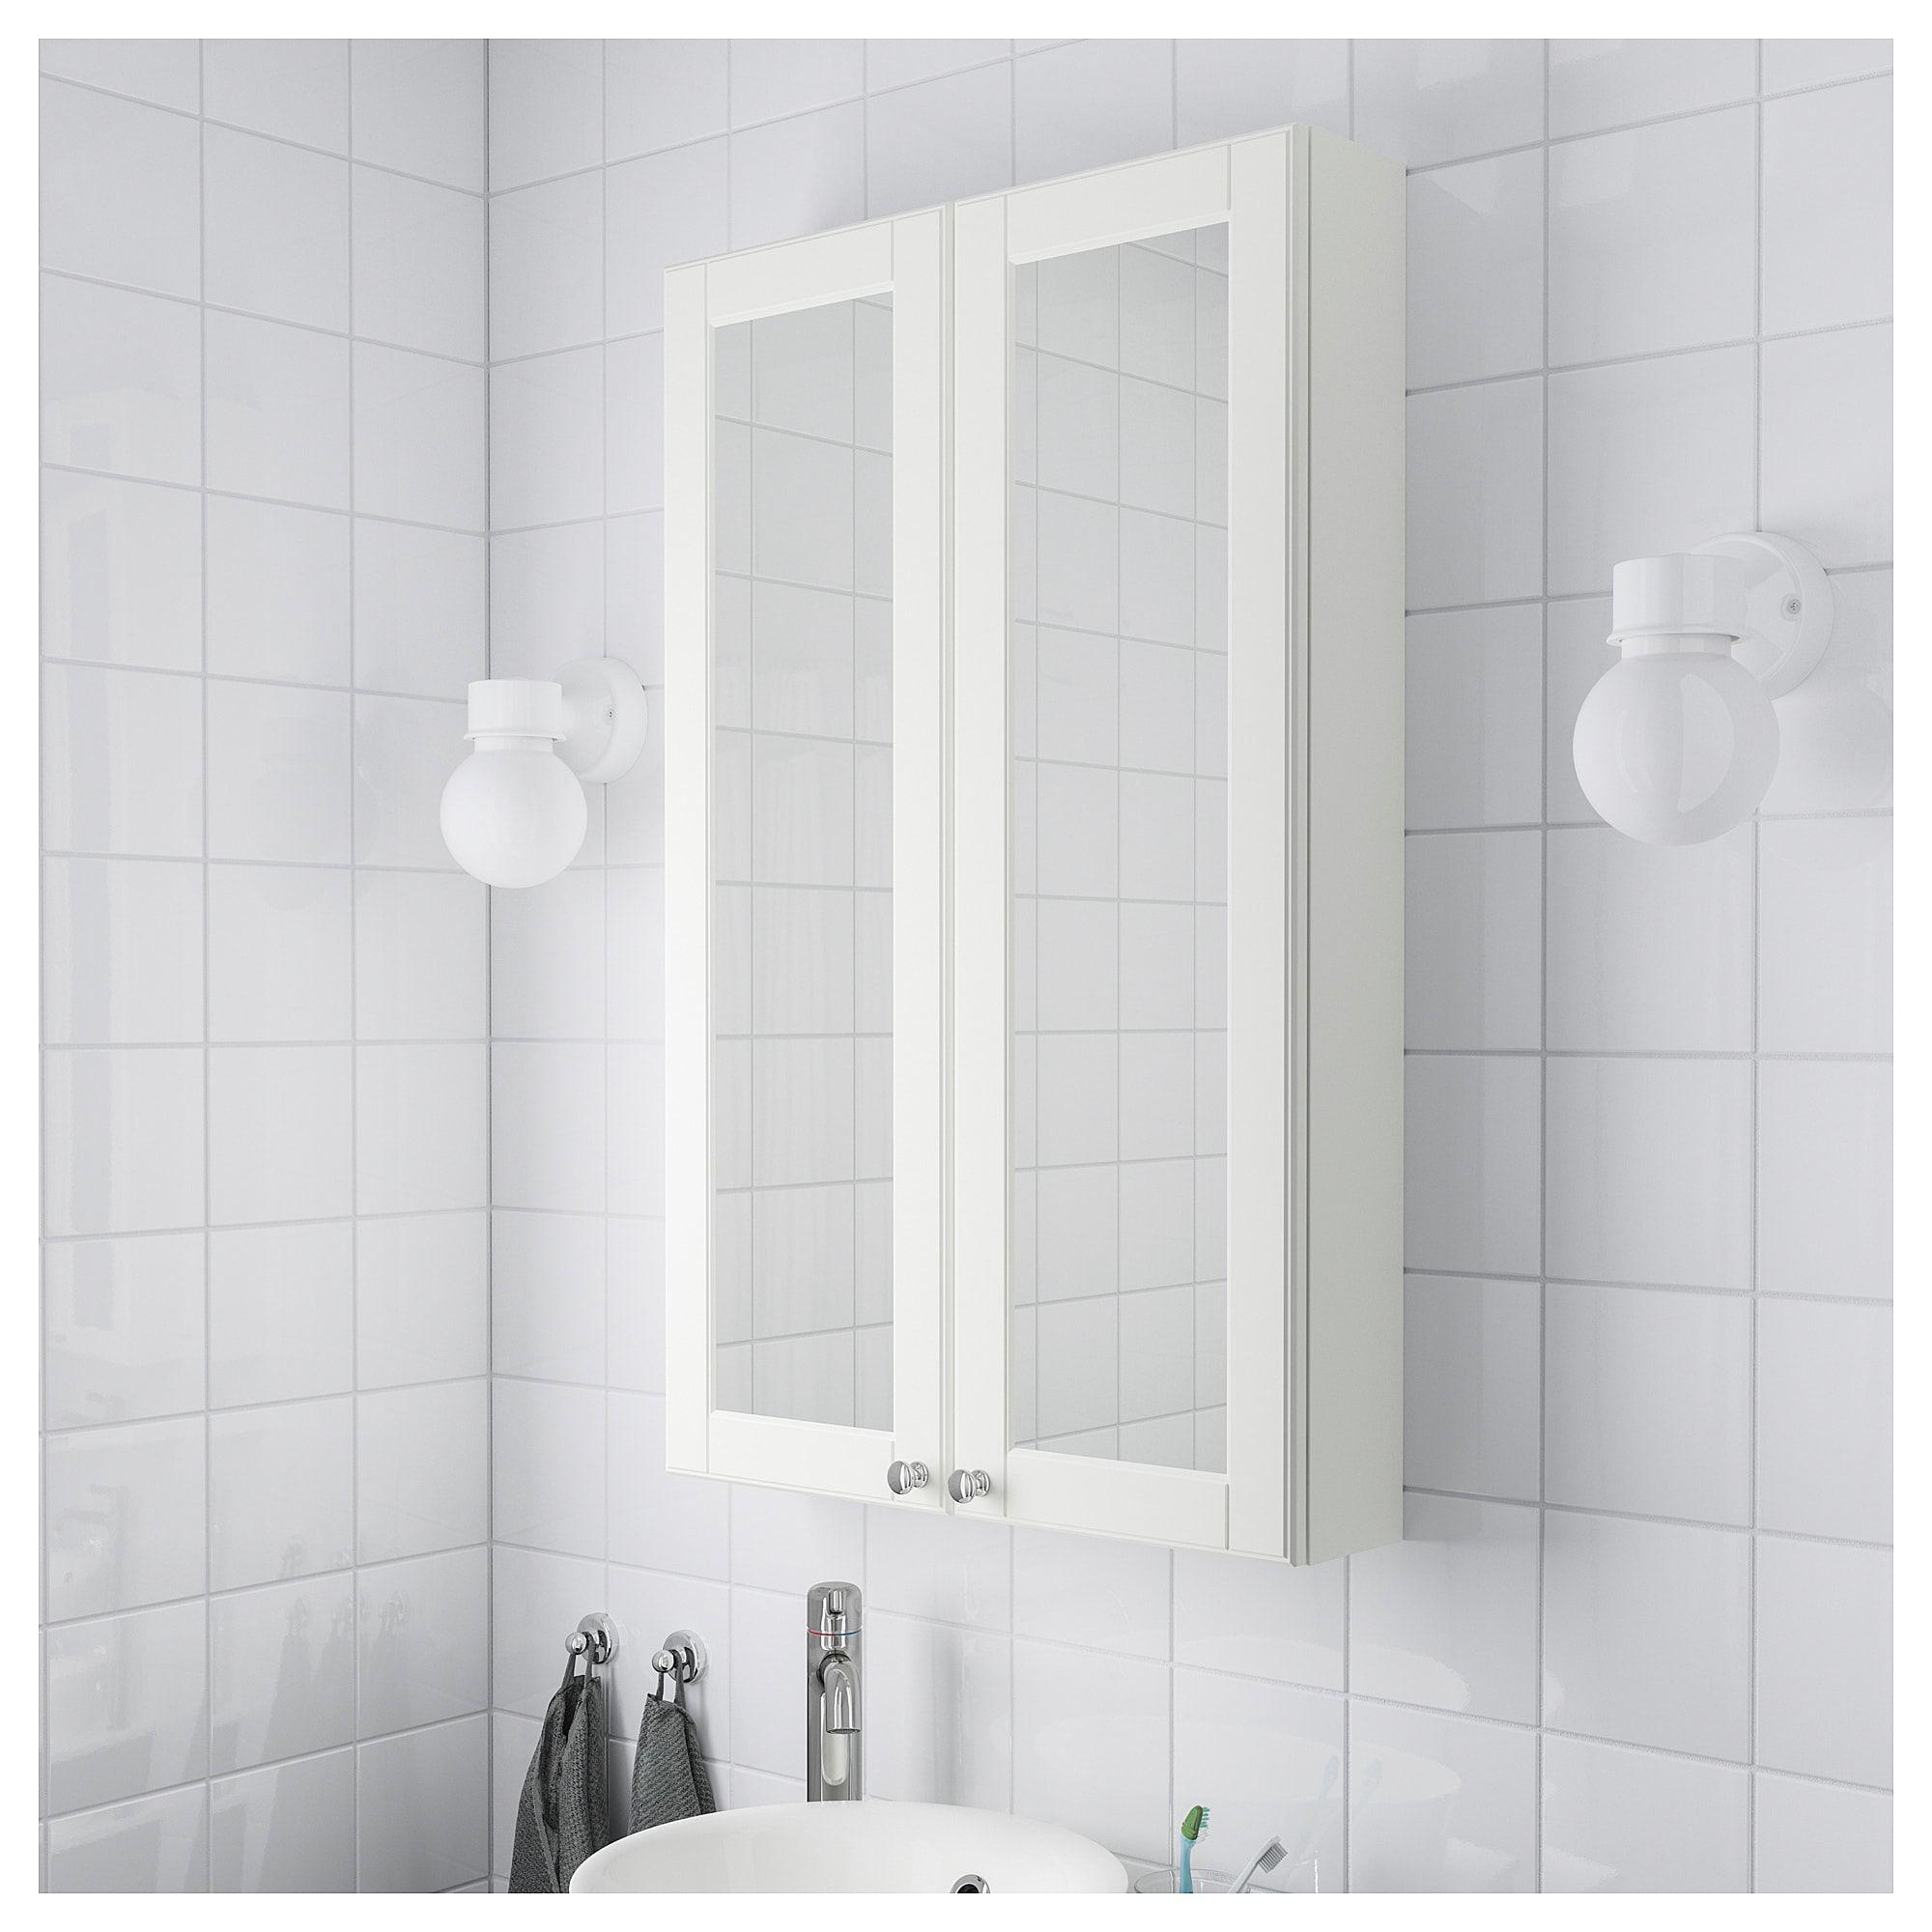 Ikea Godmorgon Kasjon White Mirror Cabinet With 2 Doors Mirror Cabinets Bathroom Mirror Cabinet Mirror Door